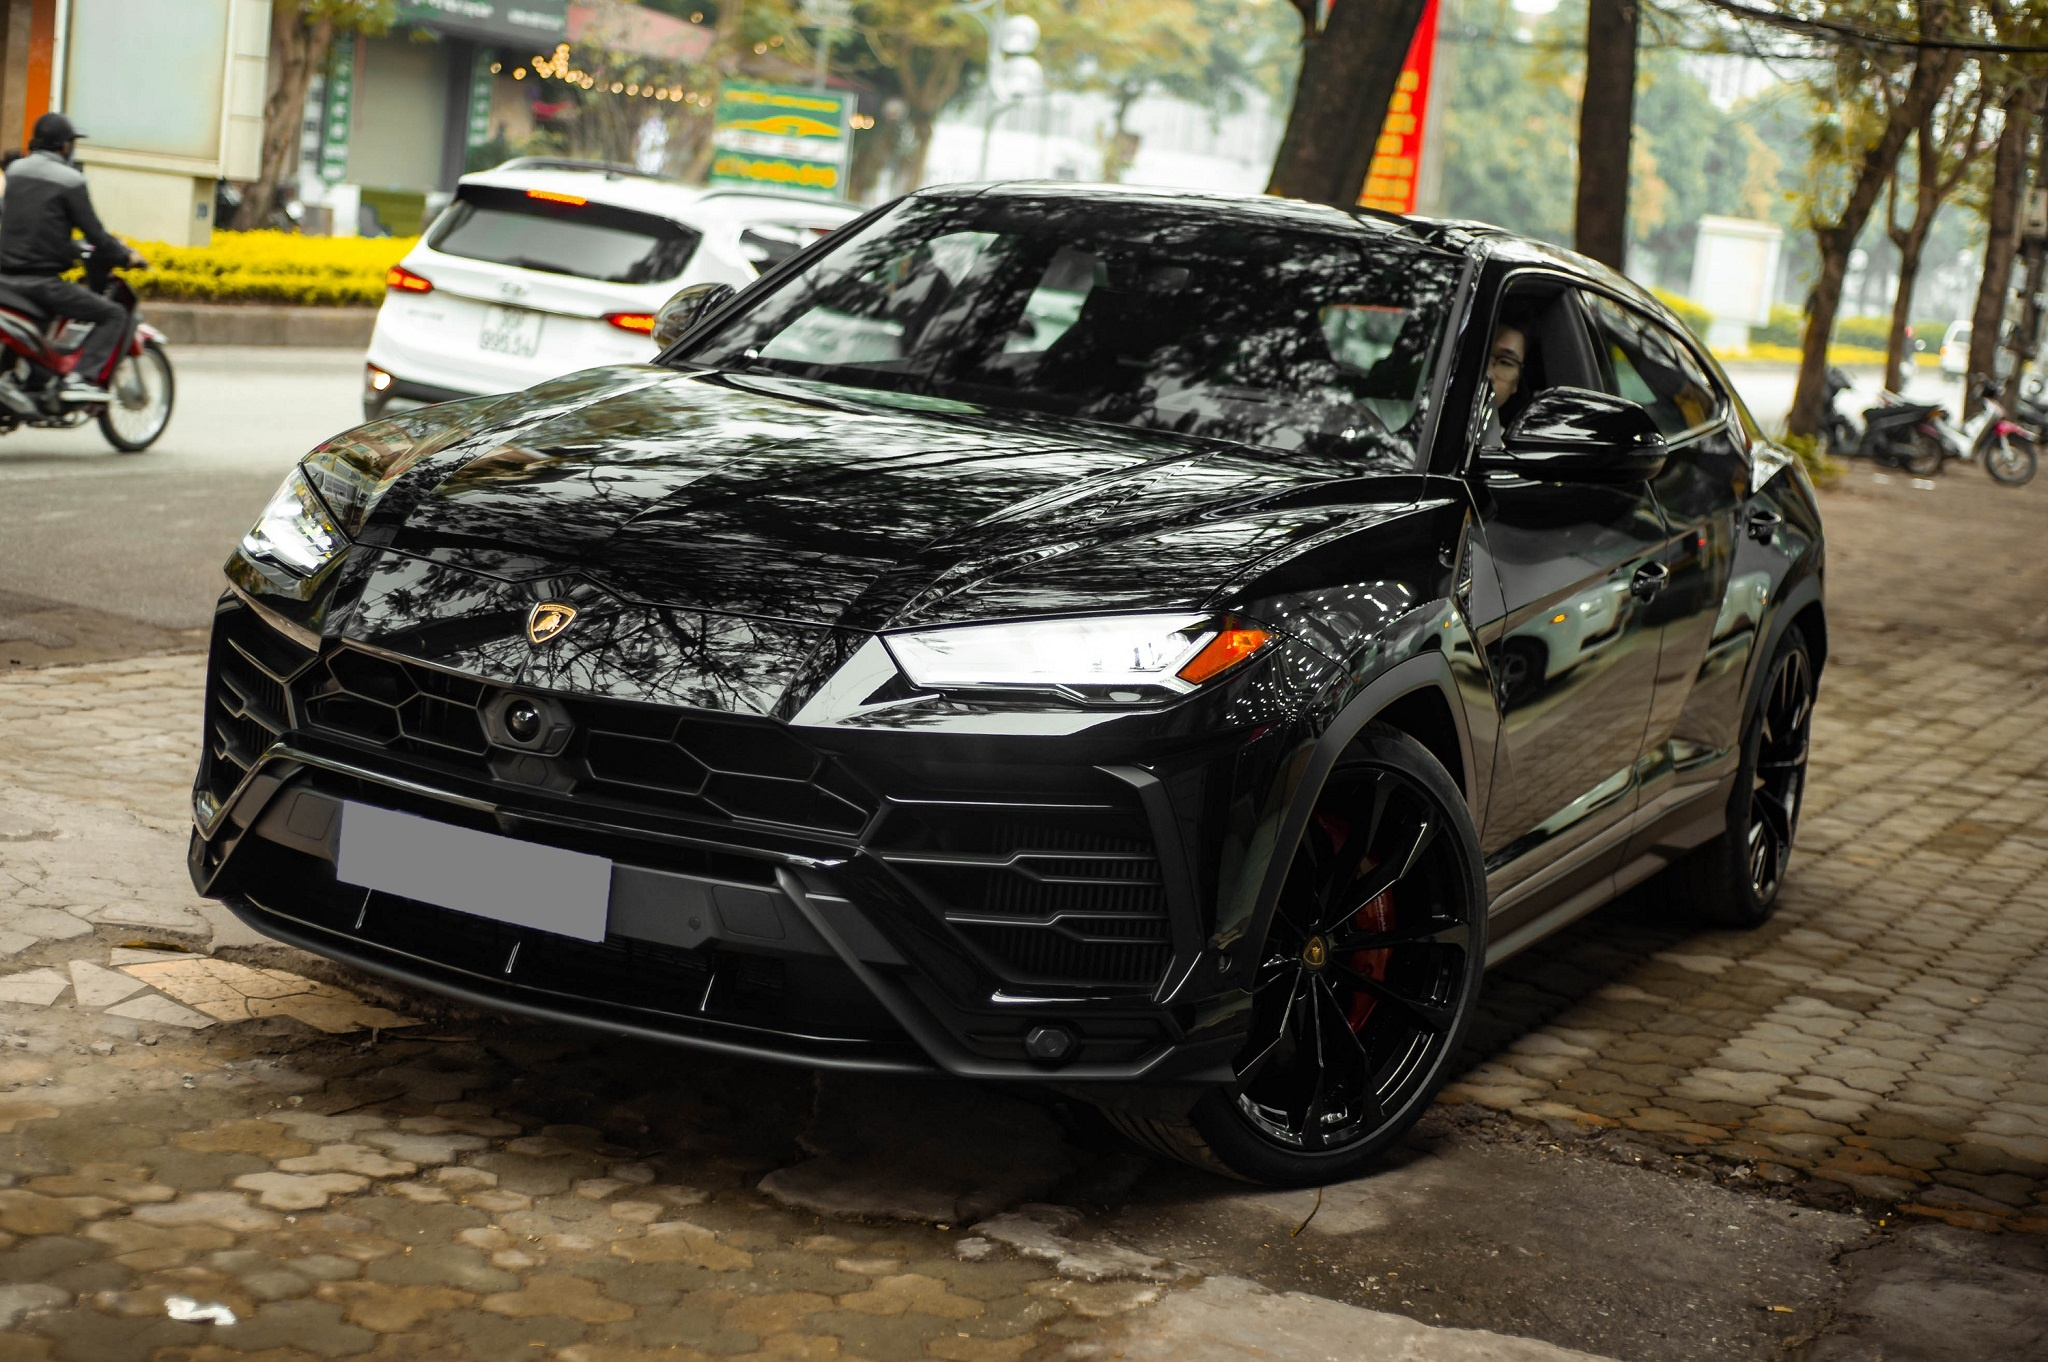 Ngam Lamborghini Urus mau den dau tien ve VN, gia khoang 1 trieu USD hinh anh 1 1_zing_22_.jpg